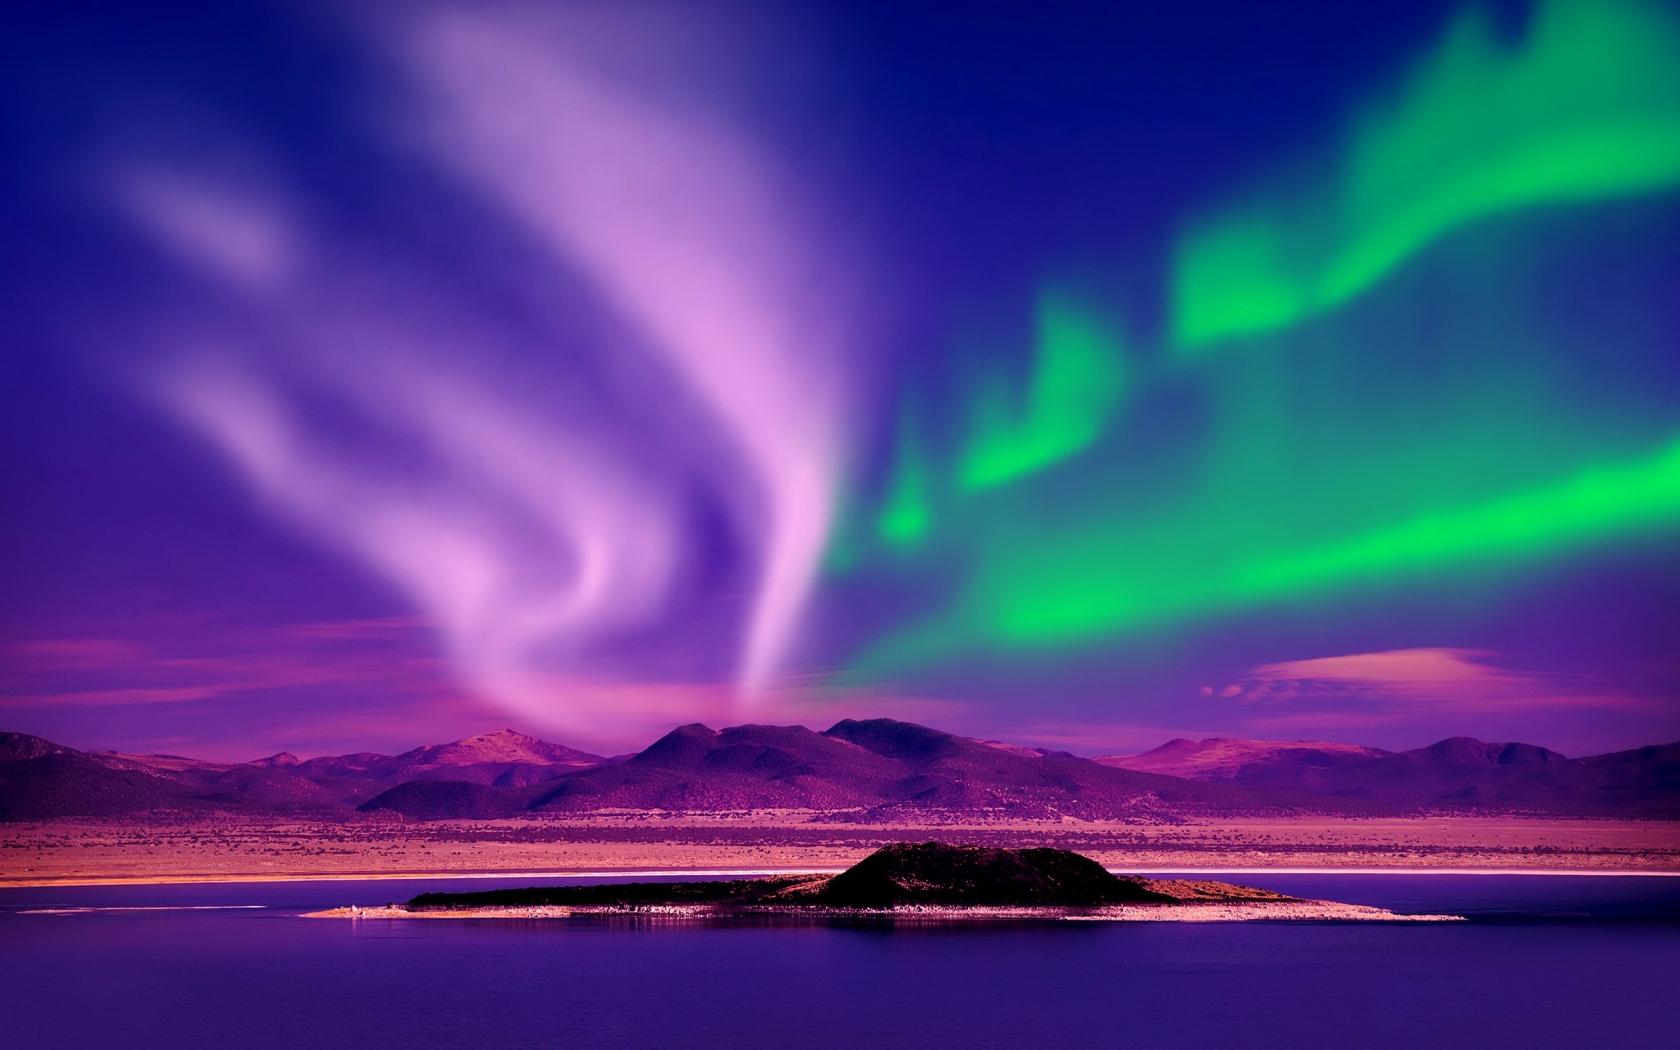 1680x1050 Aurora Borealis Canada 1680x1050 Resolution